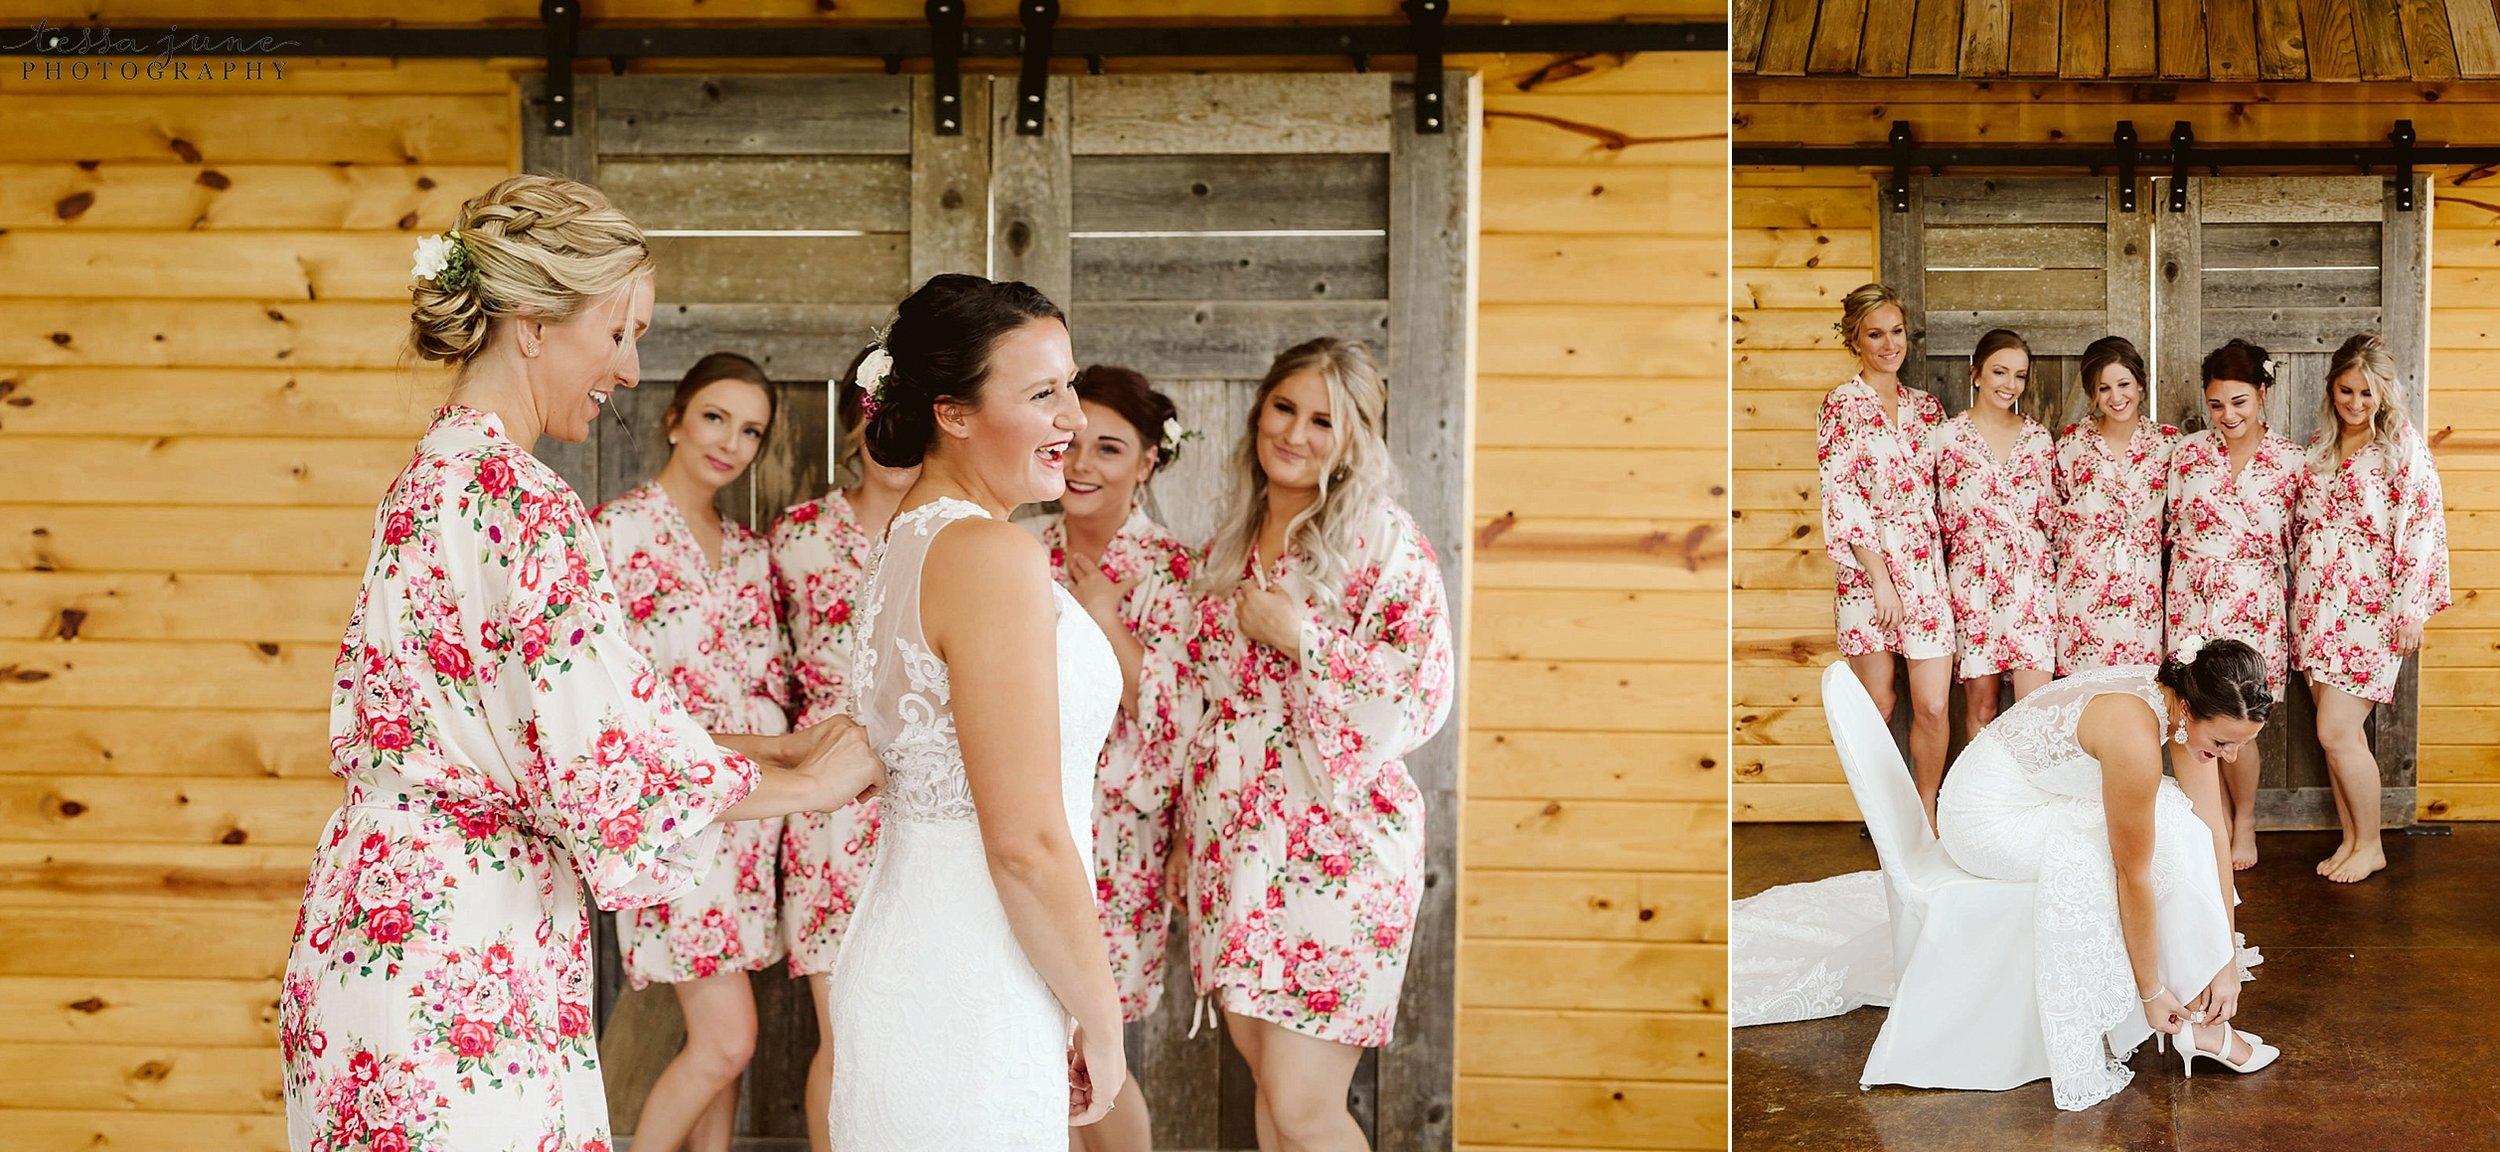 The-grands-at-mulligans-wedding-sartell-minnesota-spring-floral-spring-garden-wedding-31.jpg